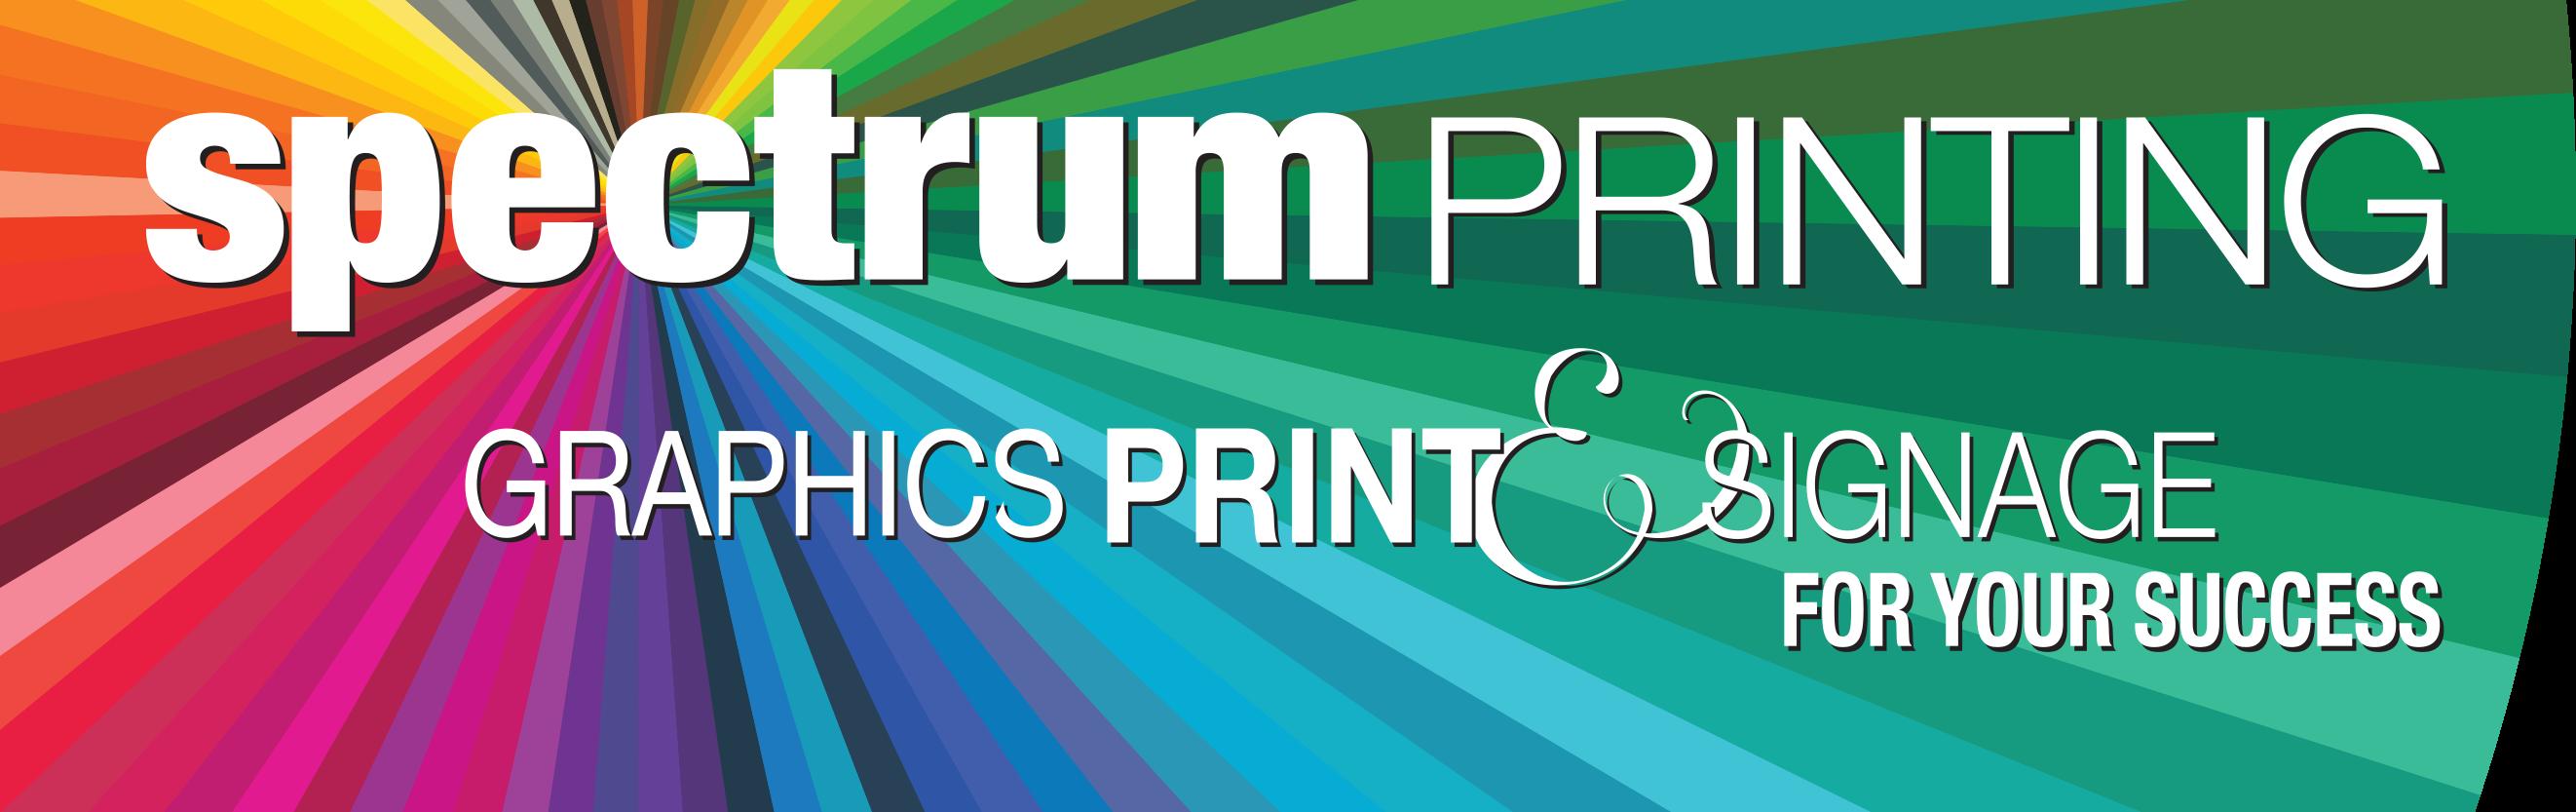 Spectrum Printing